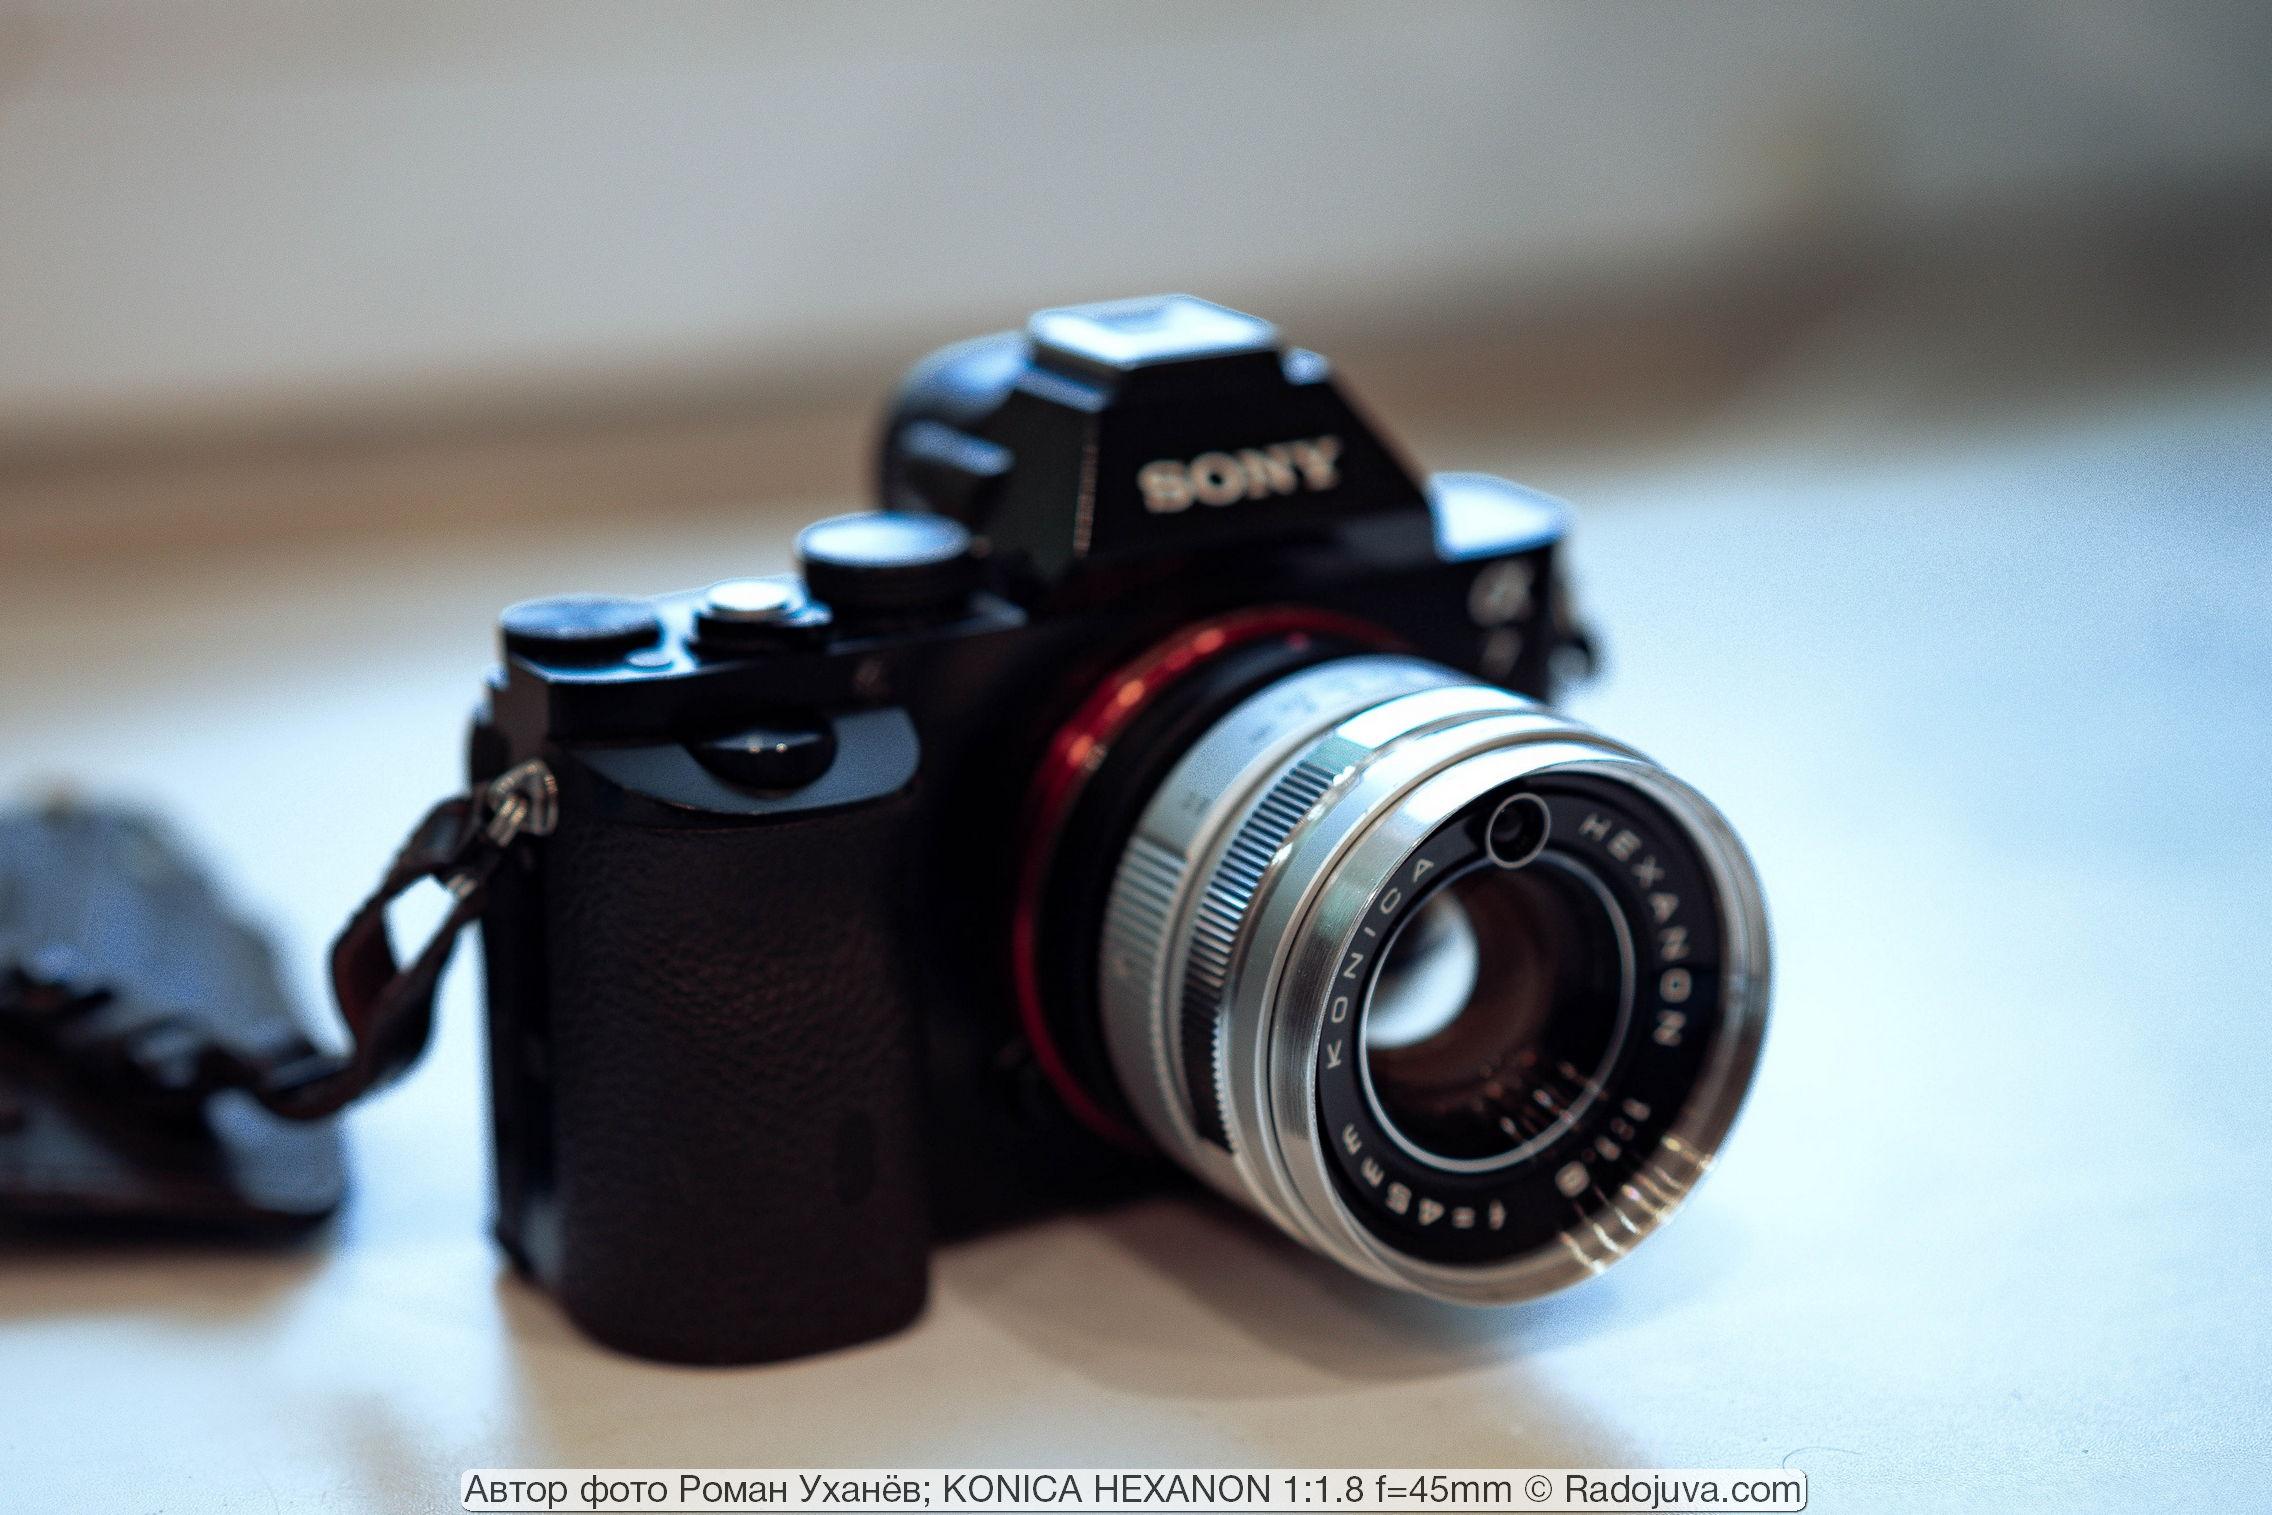 KONICA HEXANON 1:1.8 f=45mm